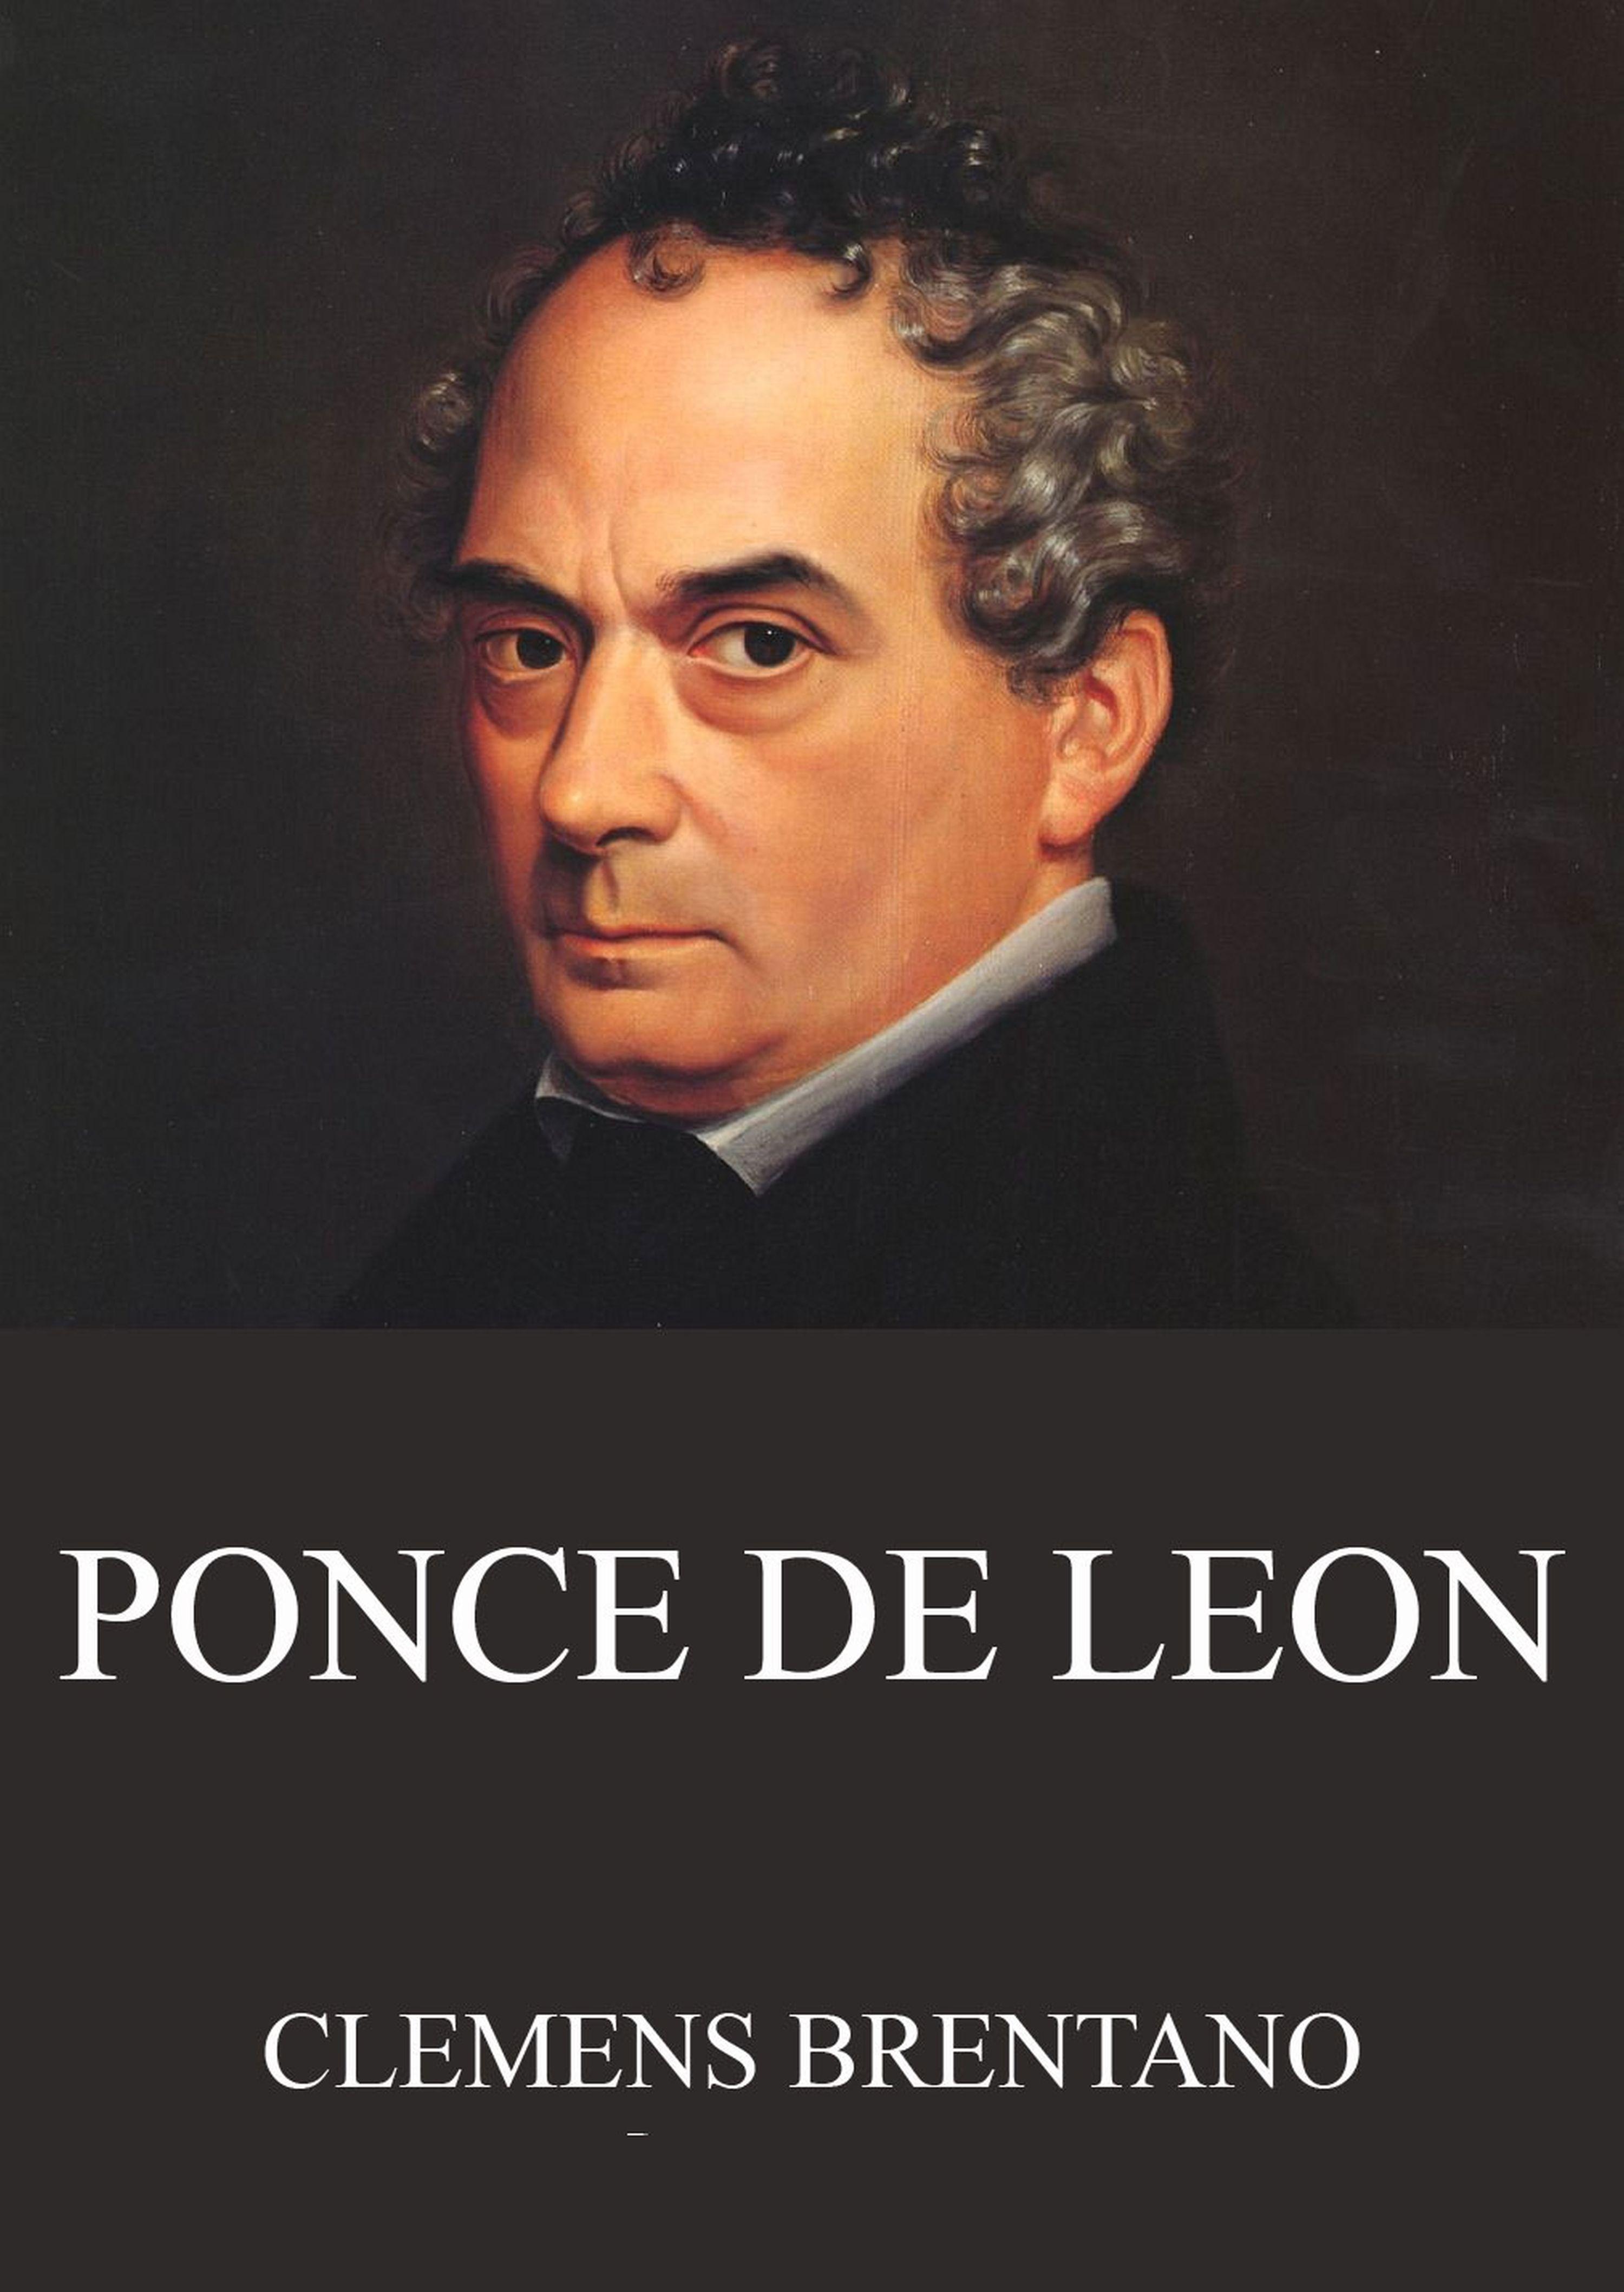 Clemens Brentano Ponce de Leon clemens brentano marchen